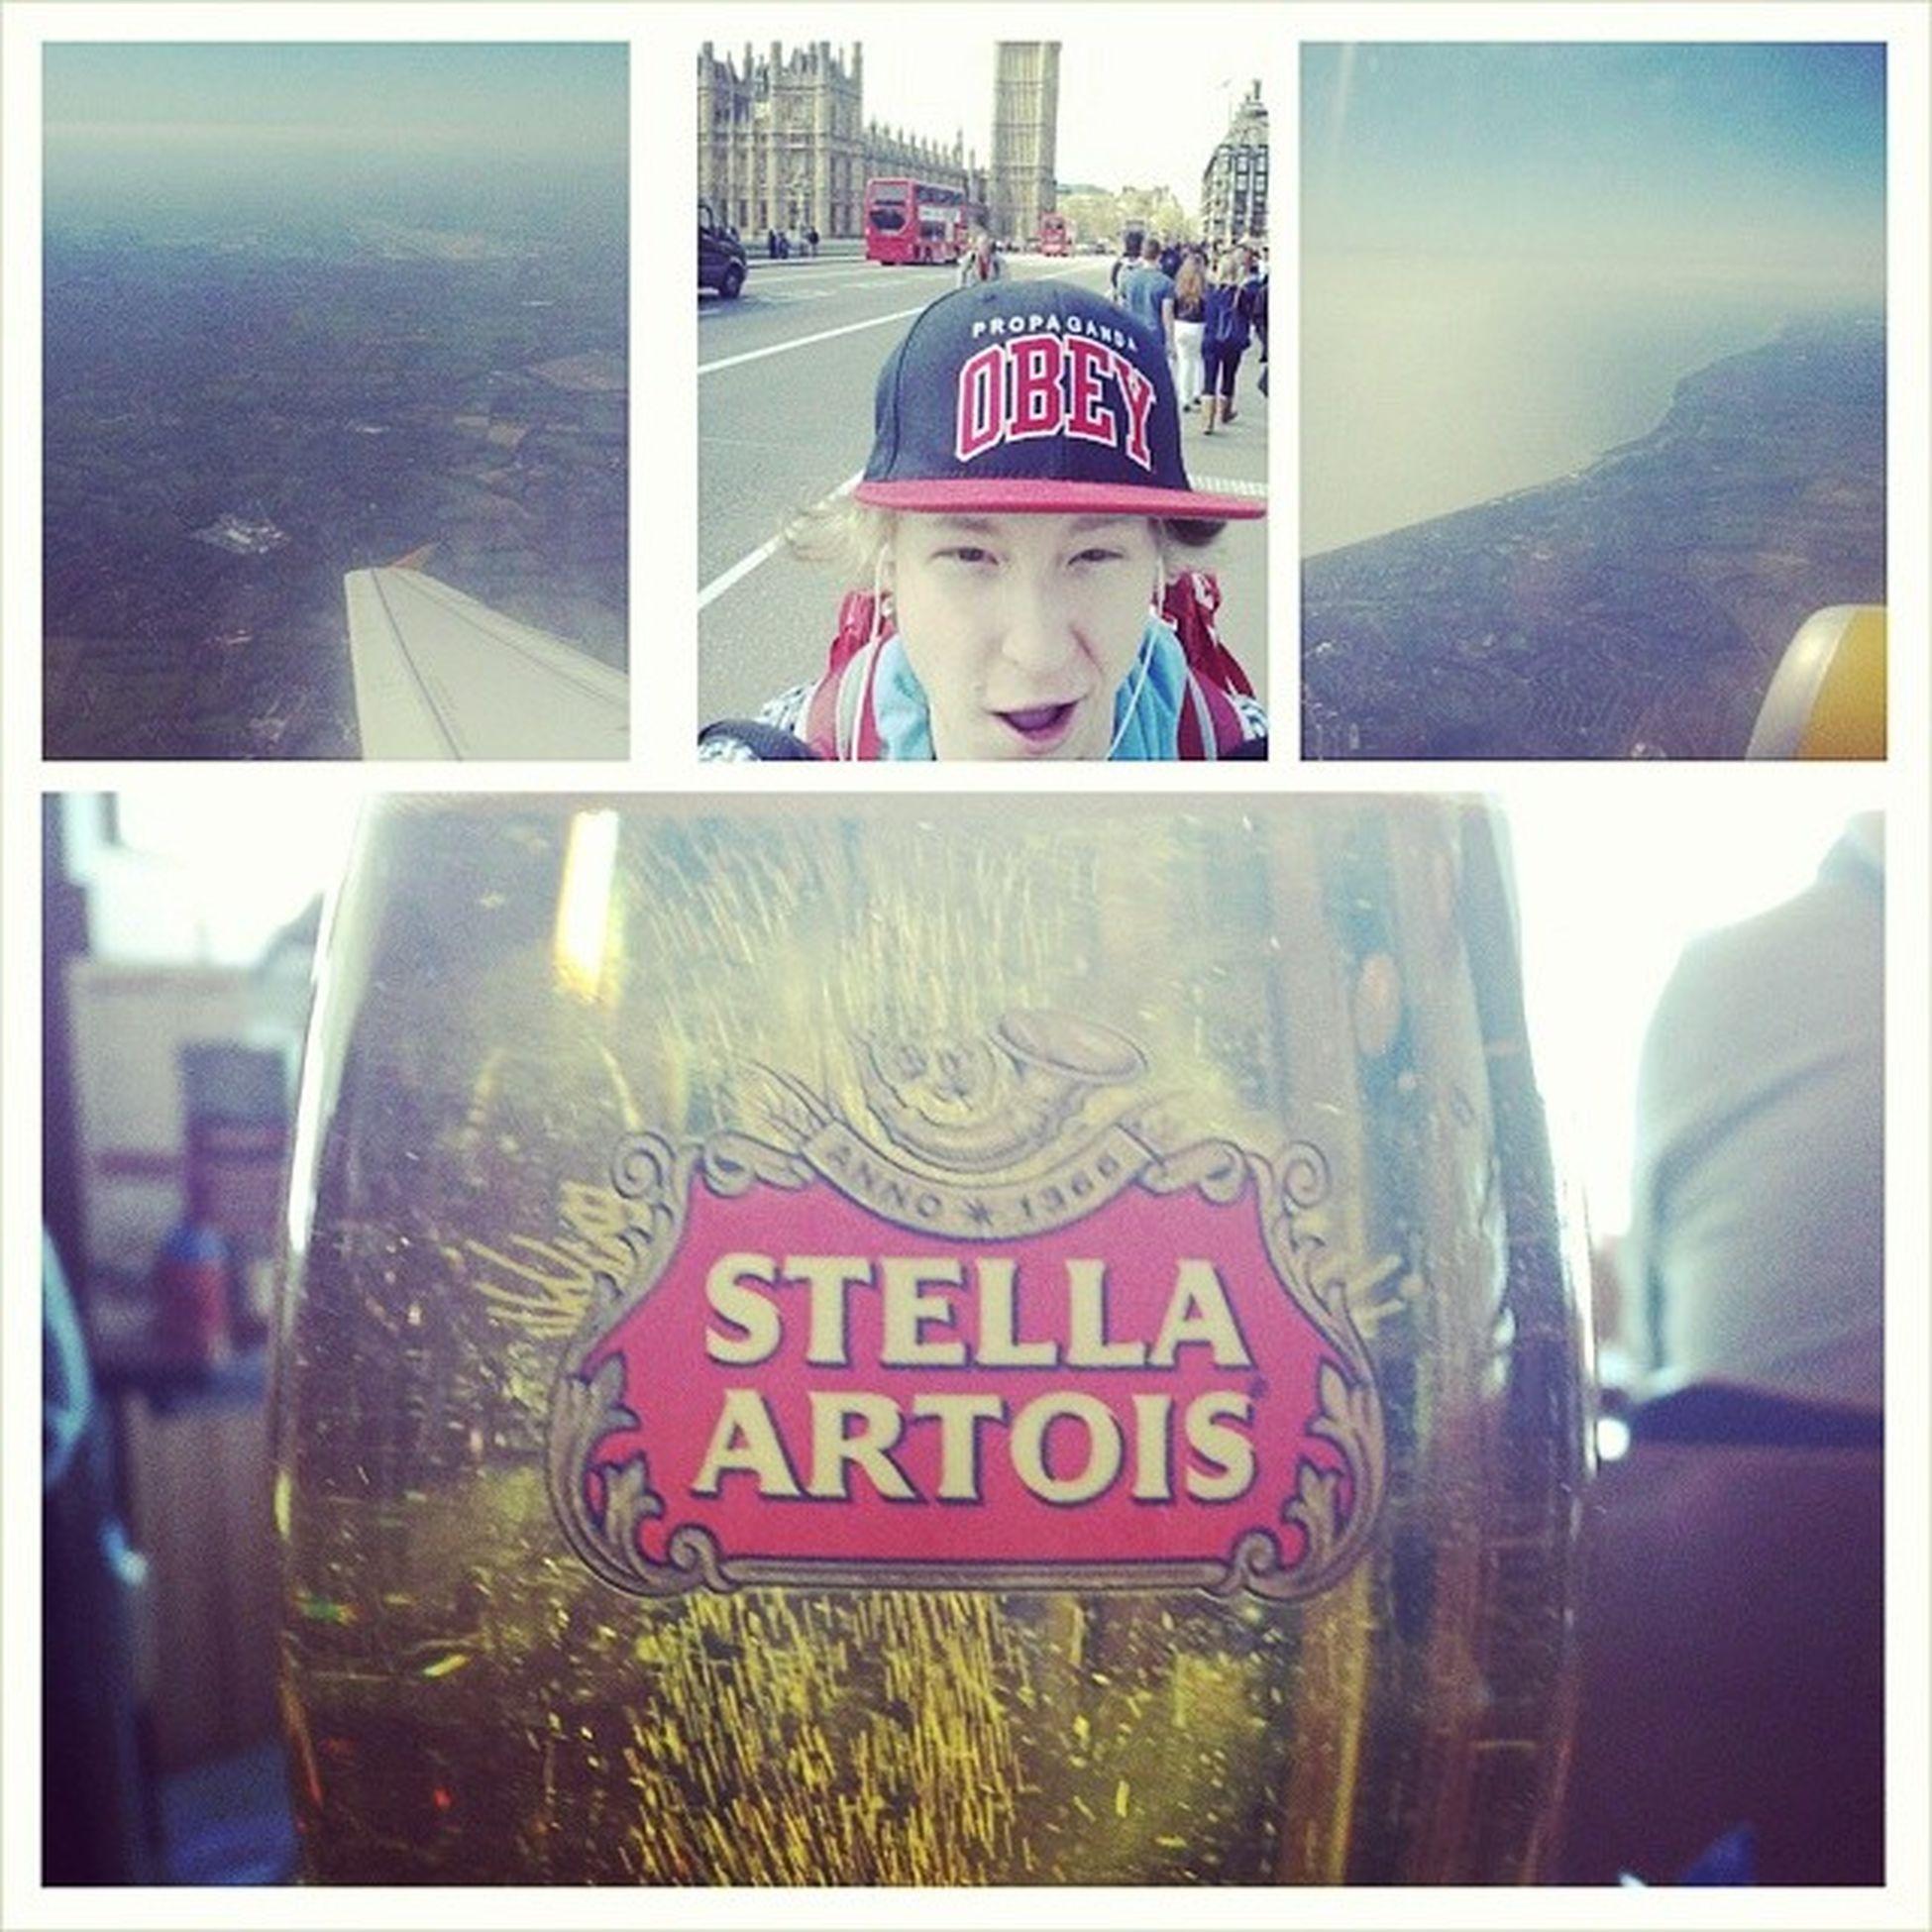 Byebyelondon Airportbeers Selfie Barcelonahereicome goodday